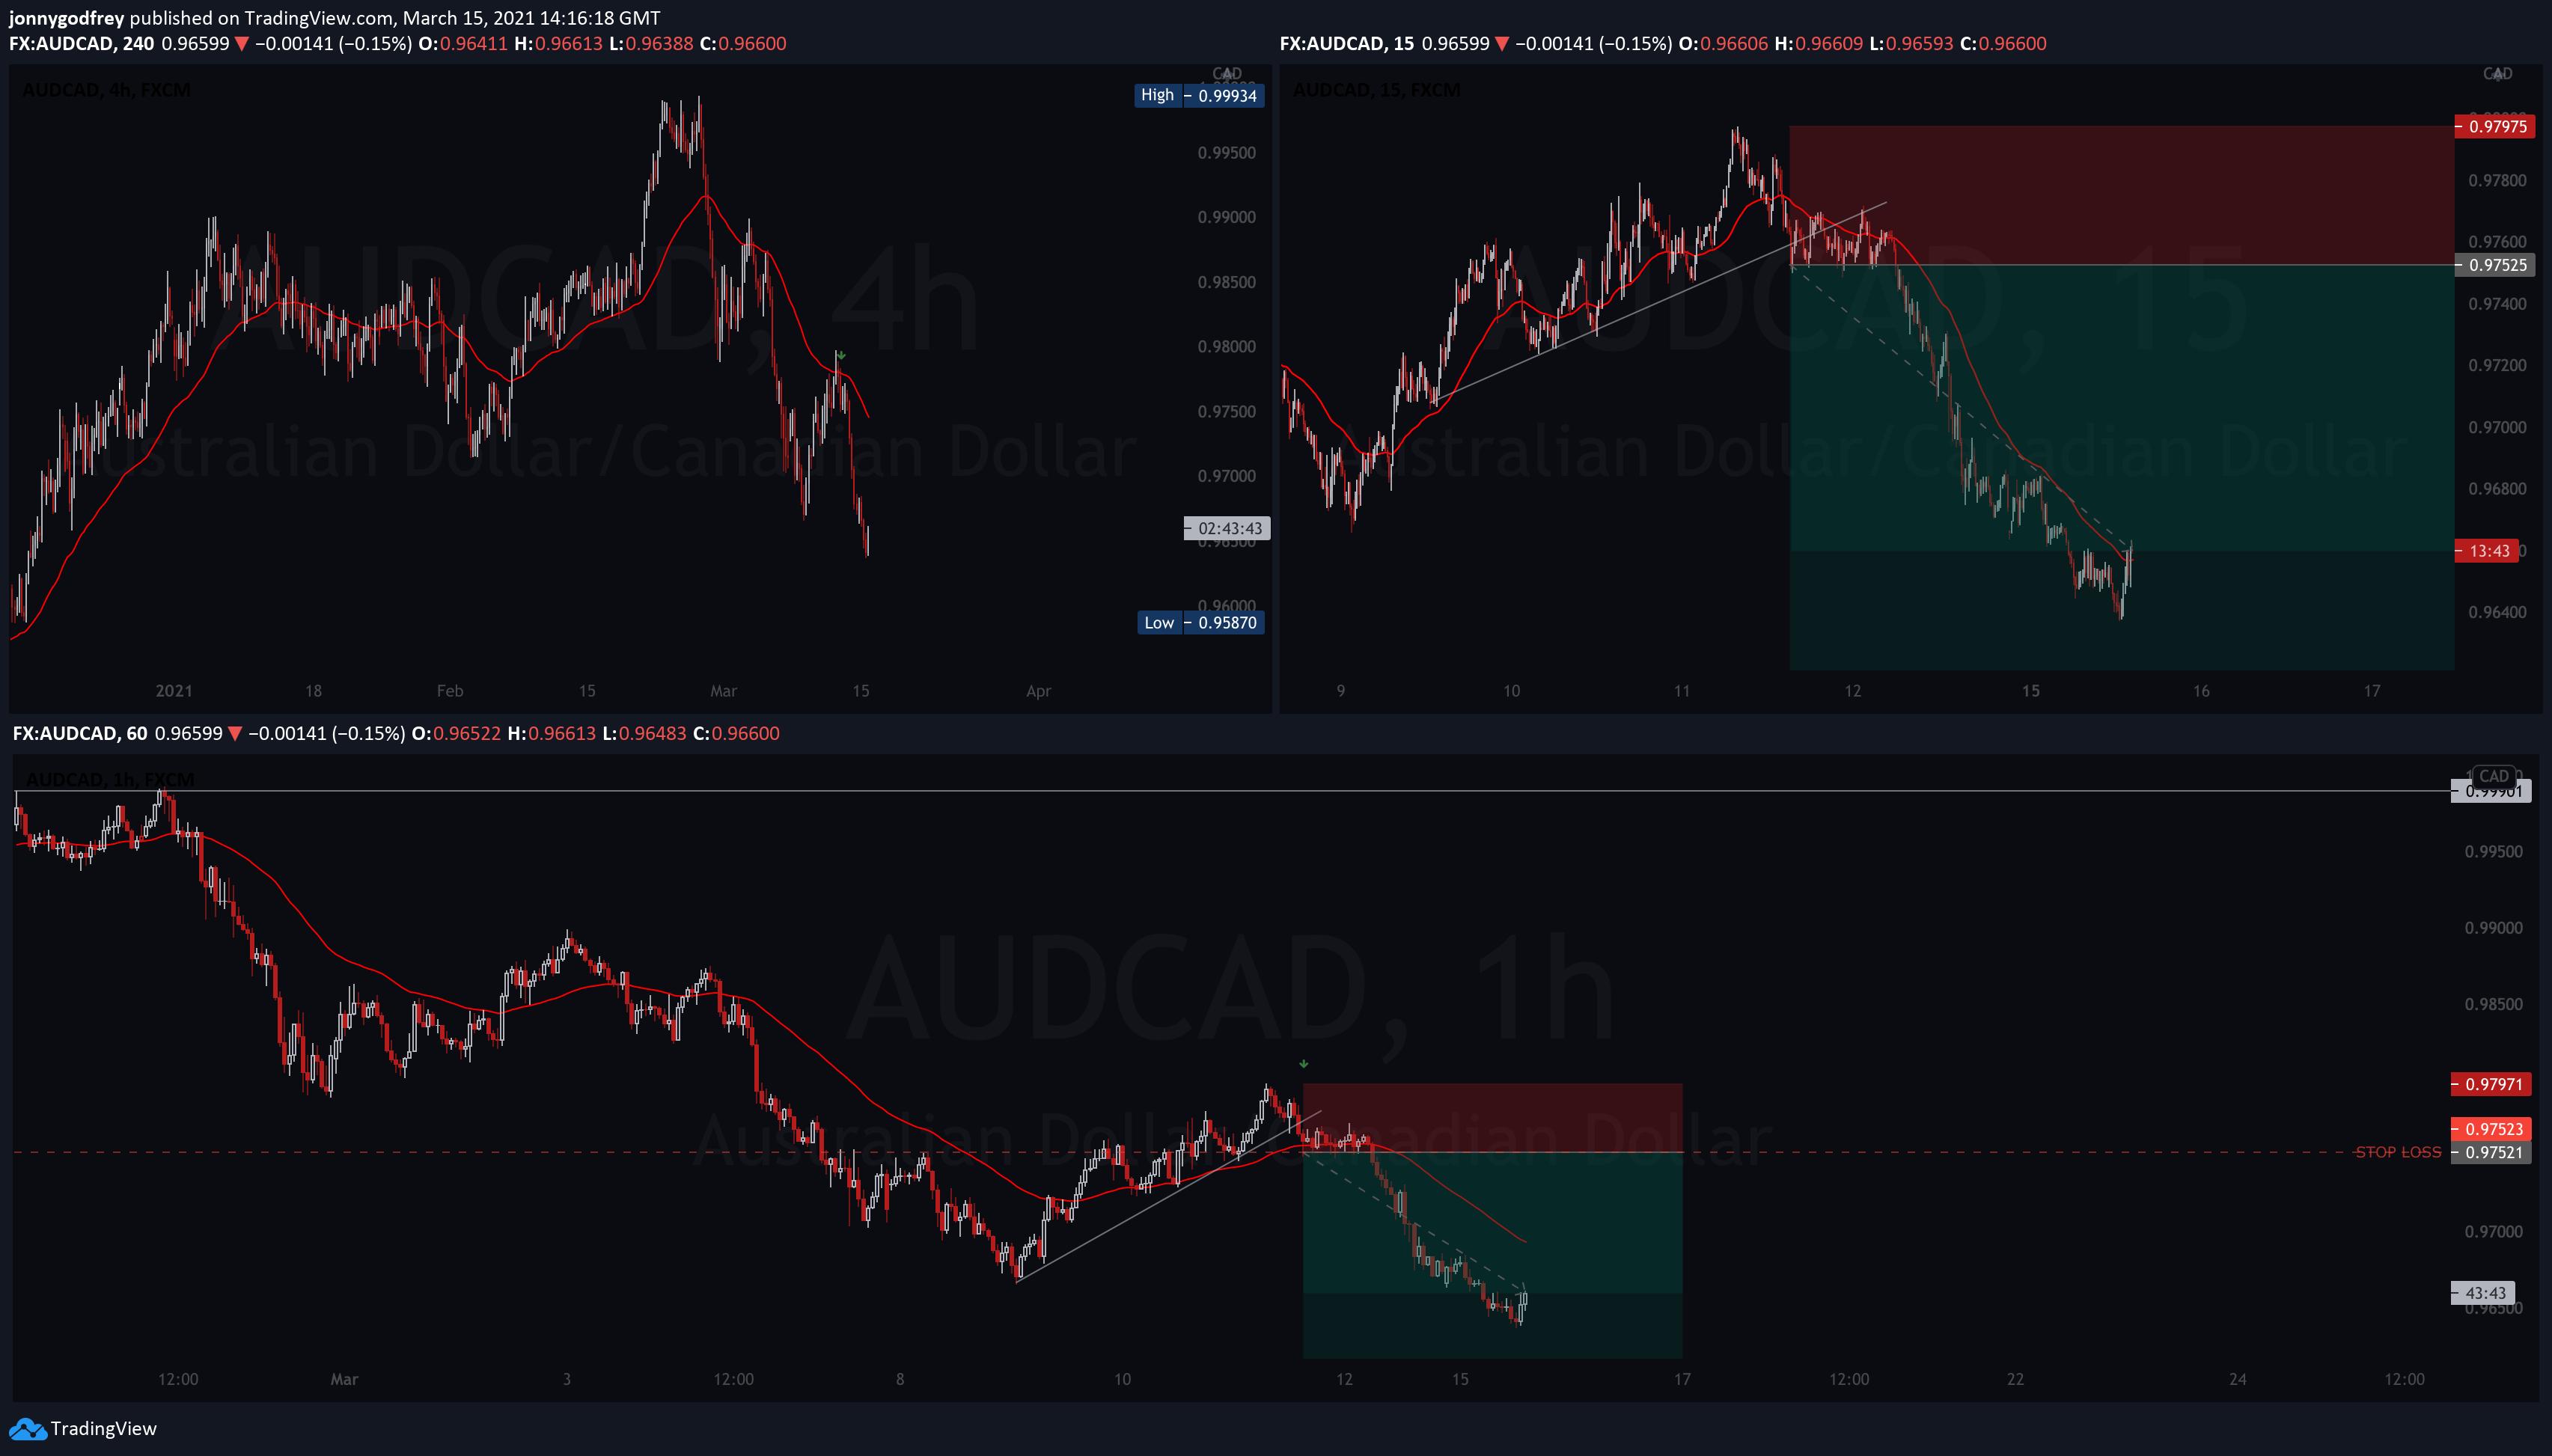 AUDCAD 4 hour chart